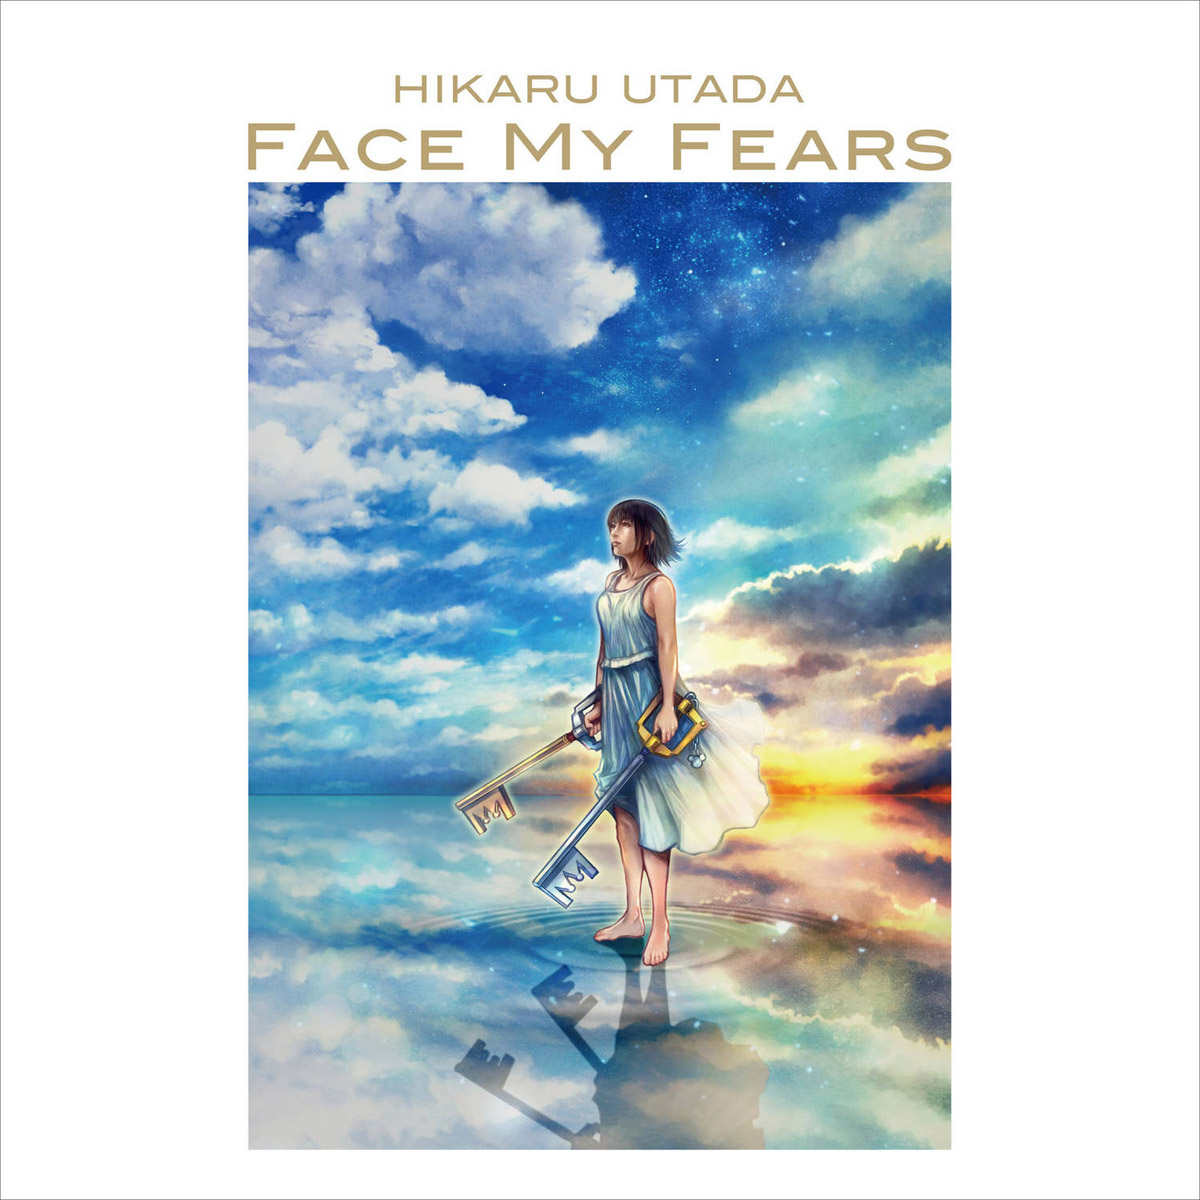 Хикару Утада,Skrillex Hikaru Utada, Skrillex. Face My Fears From Kingdom Hearts 3 Video Game (LP) цена и фото